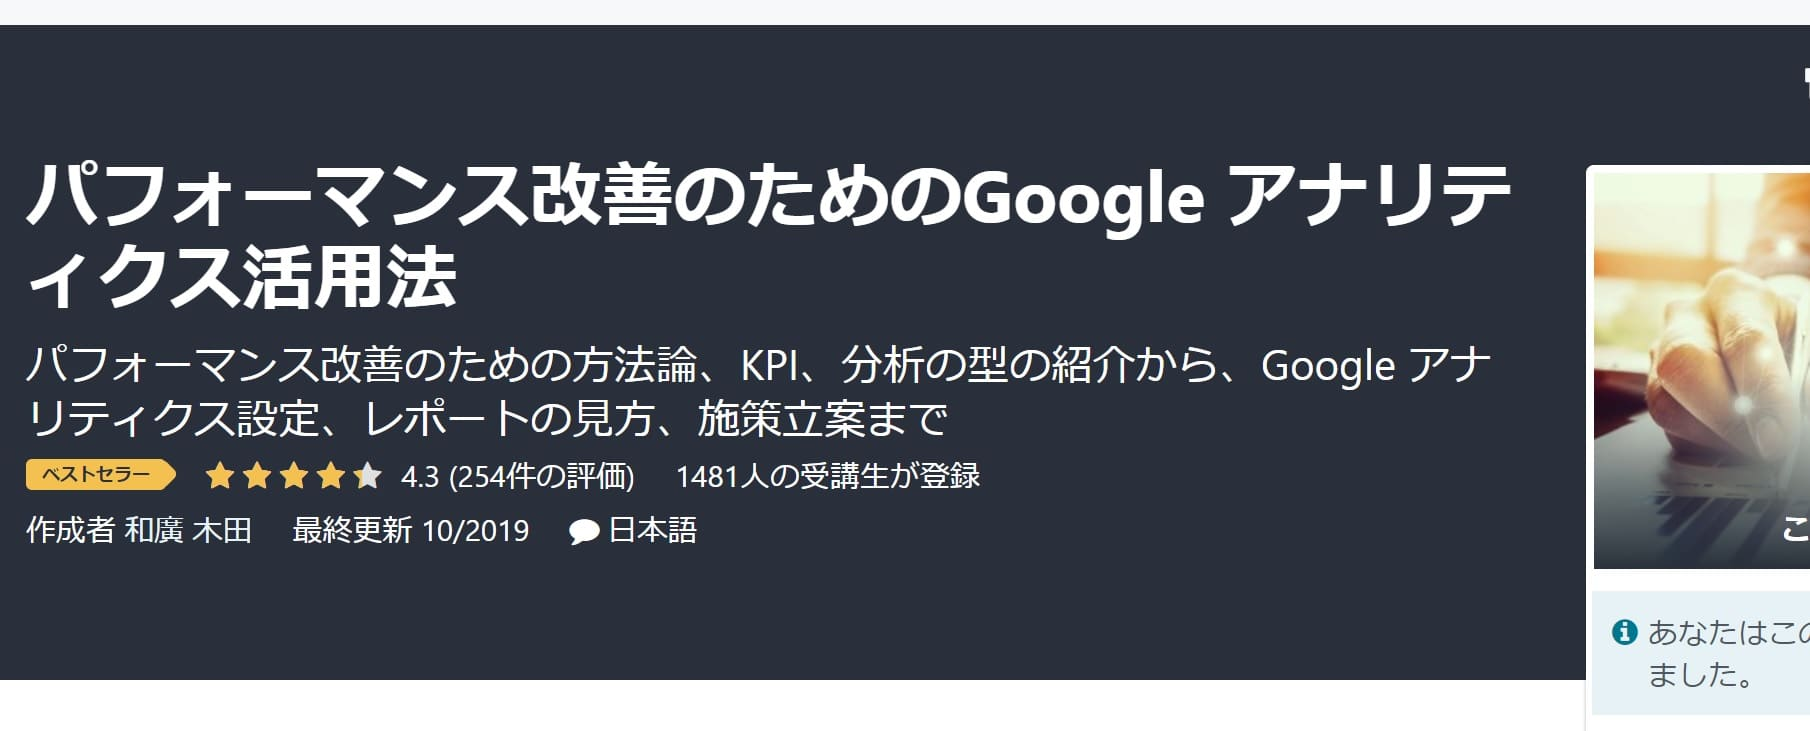 Udemy Googleアナリティクス